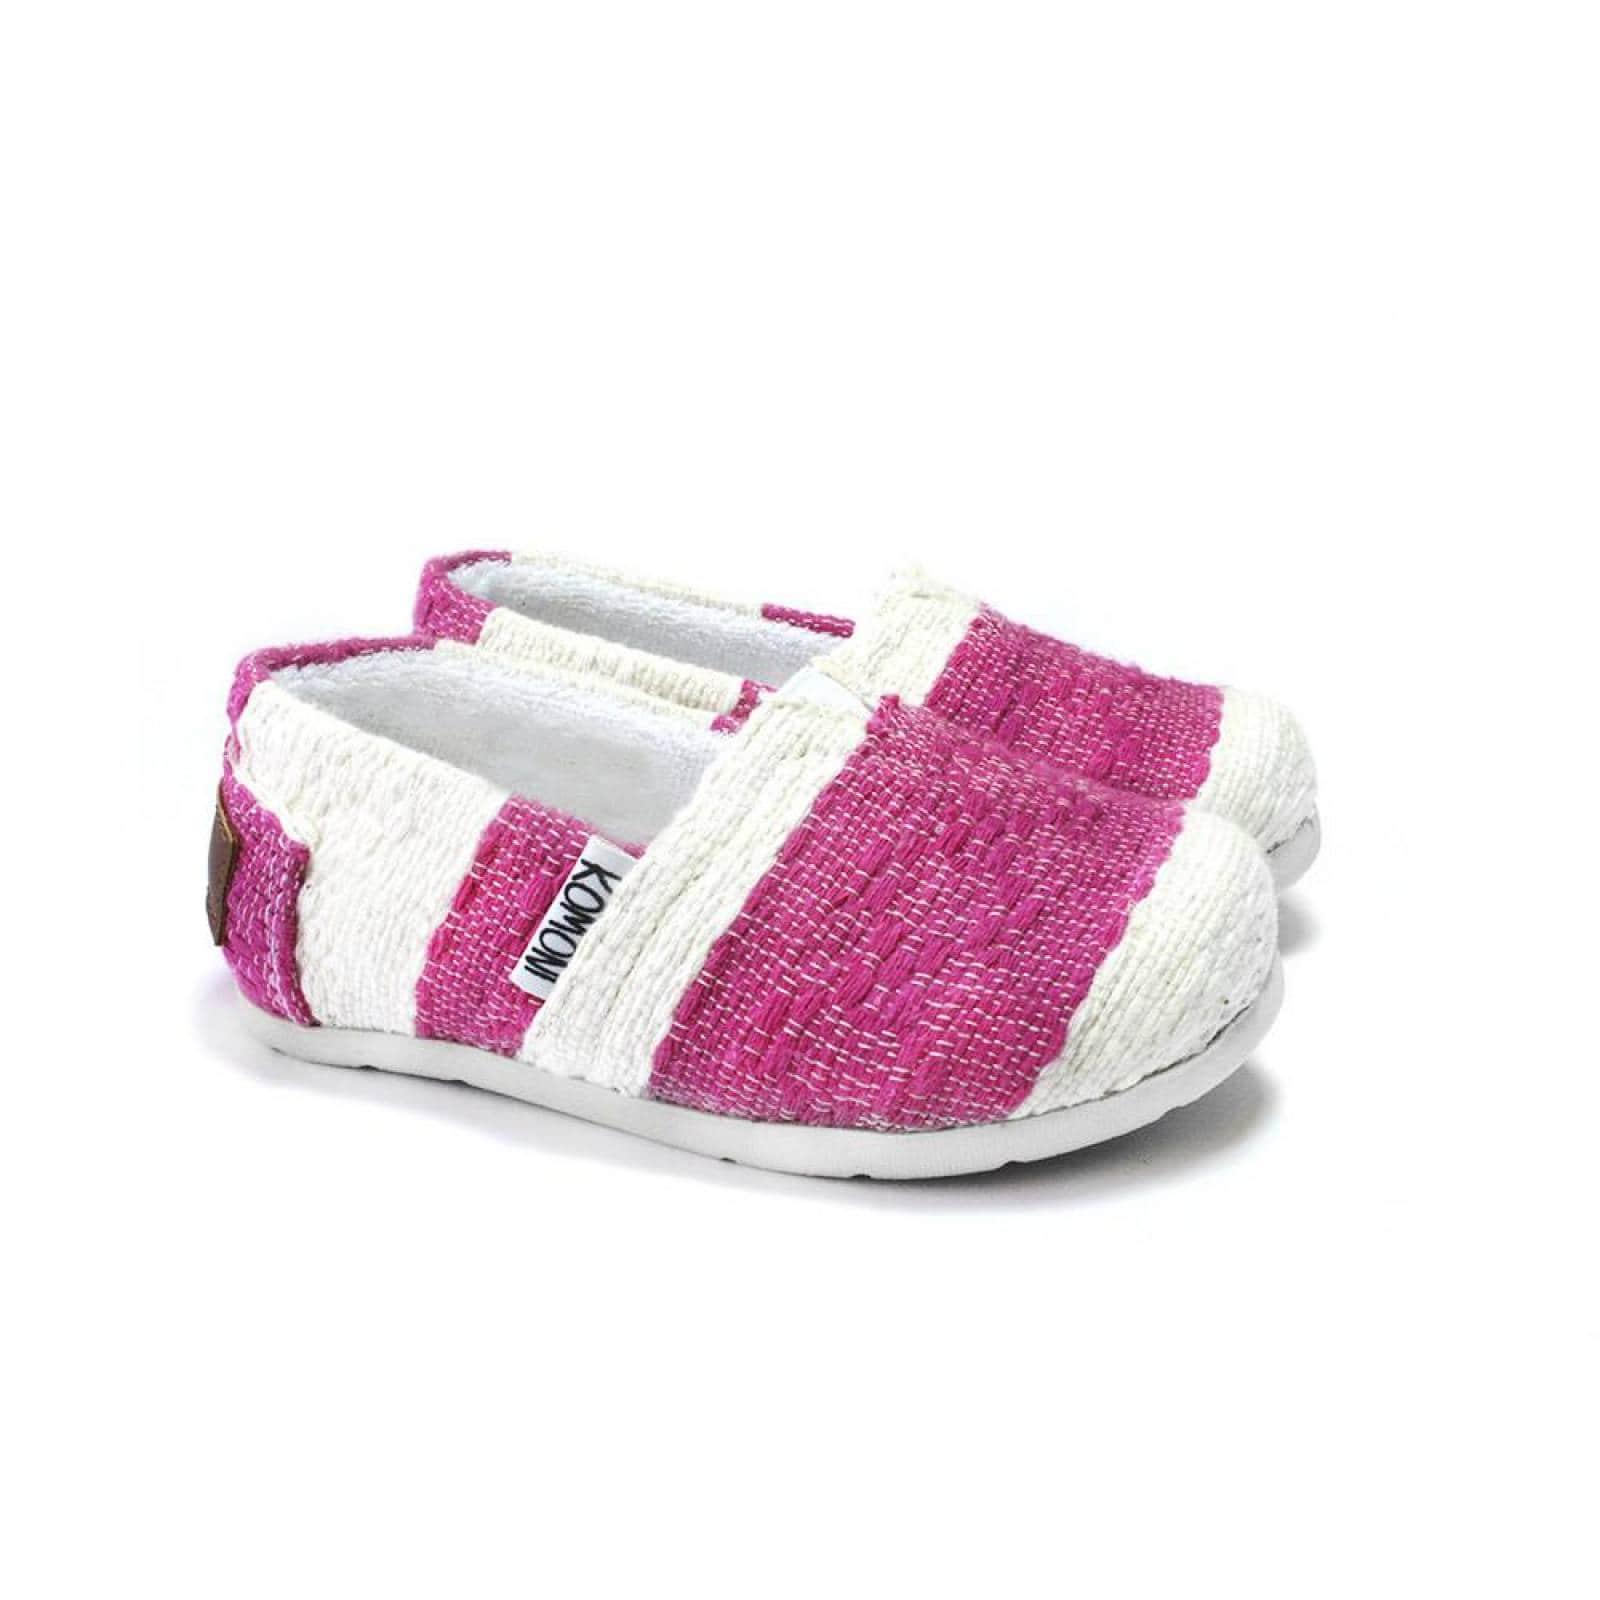 Zapato Alpargata Mini Jacinta Artesanal Tela Infantil Rosa Komoni Talla: 17